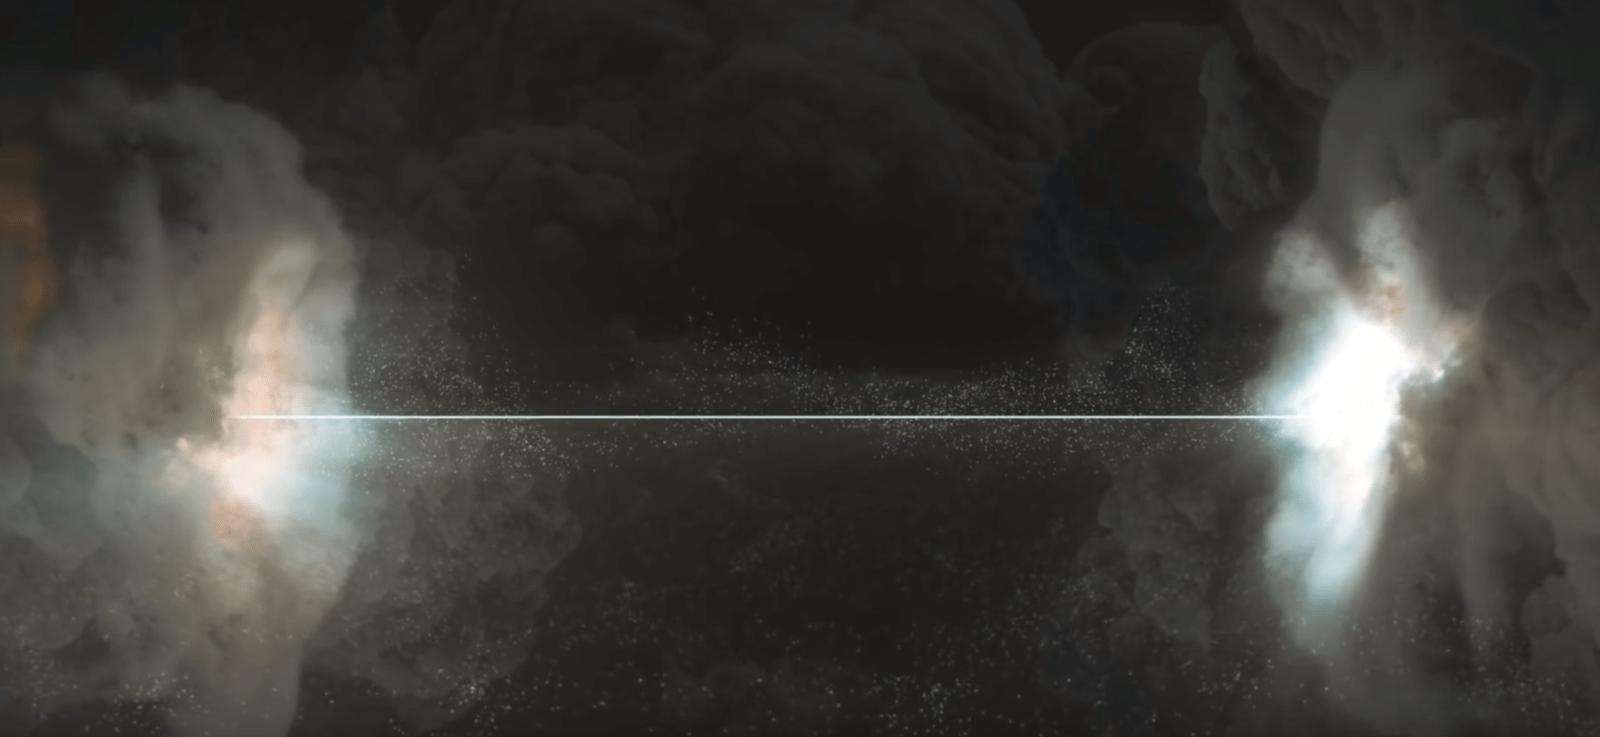 Рельеф спутника Тритон